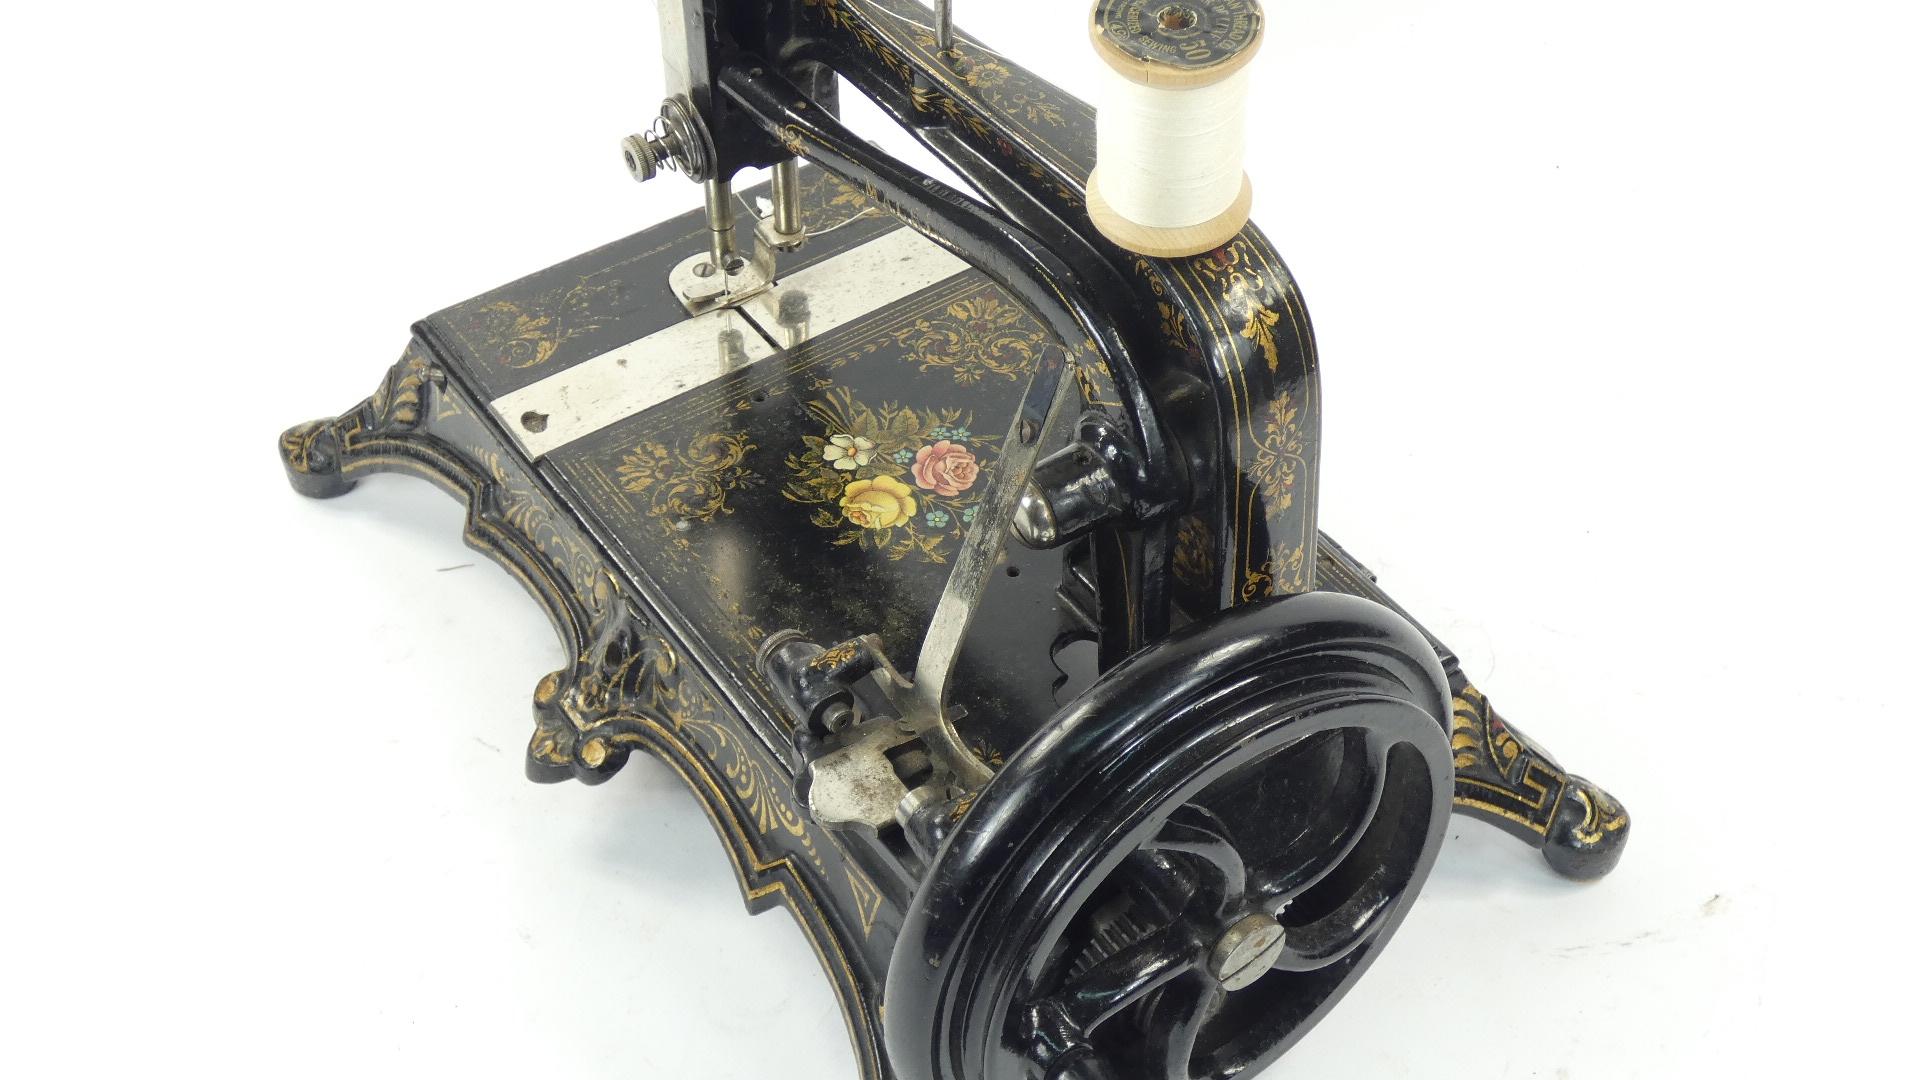 Imagen RARA TITTEL & NIES, ALEMANIA 1885 43347